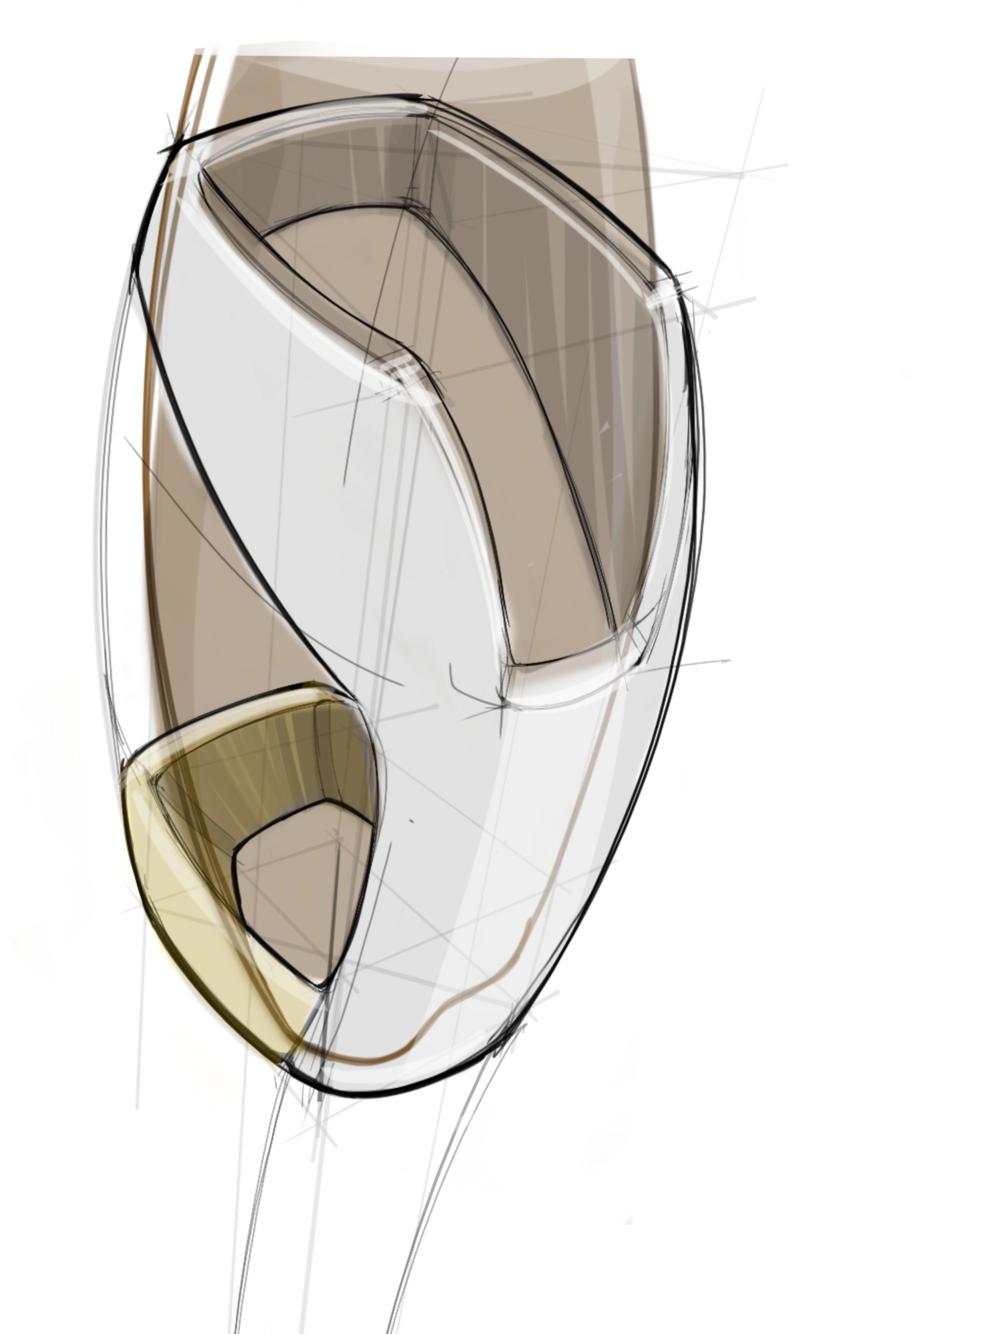 Prosthetic Leg Attachment